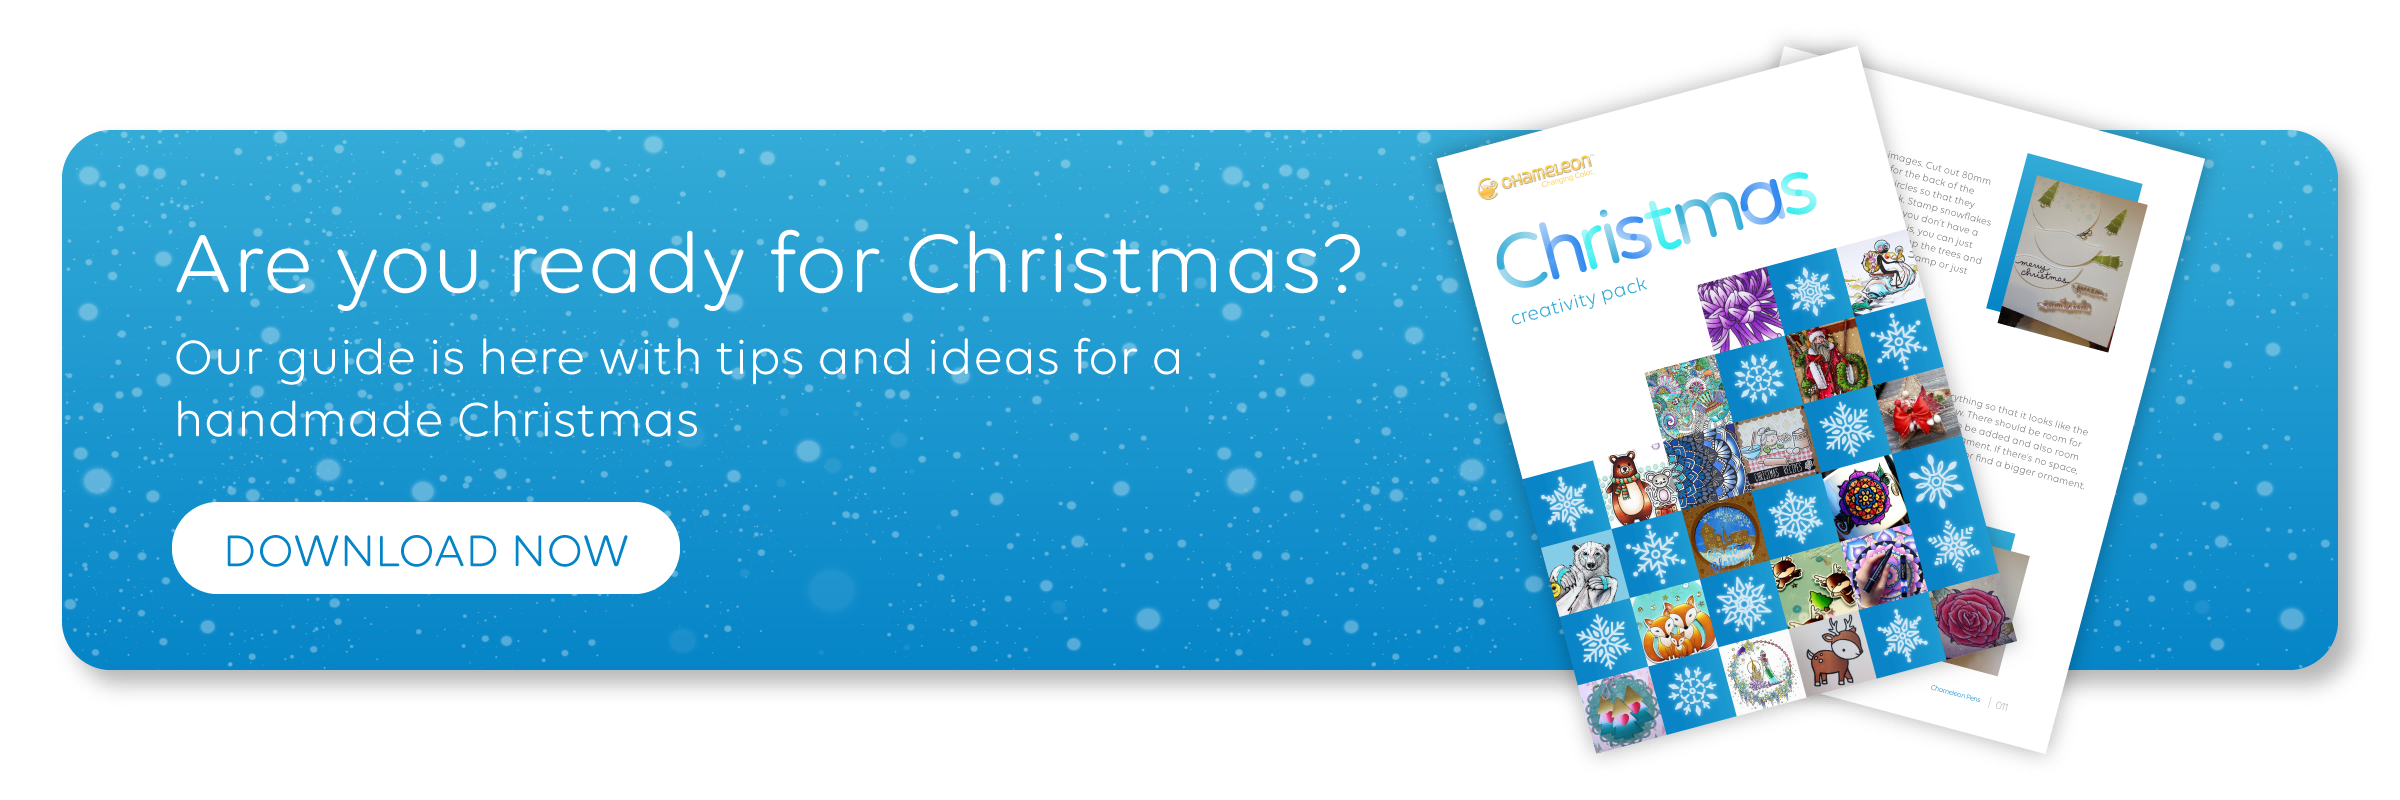 Christmas Guide CTA 1